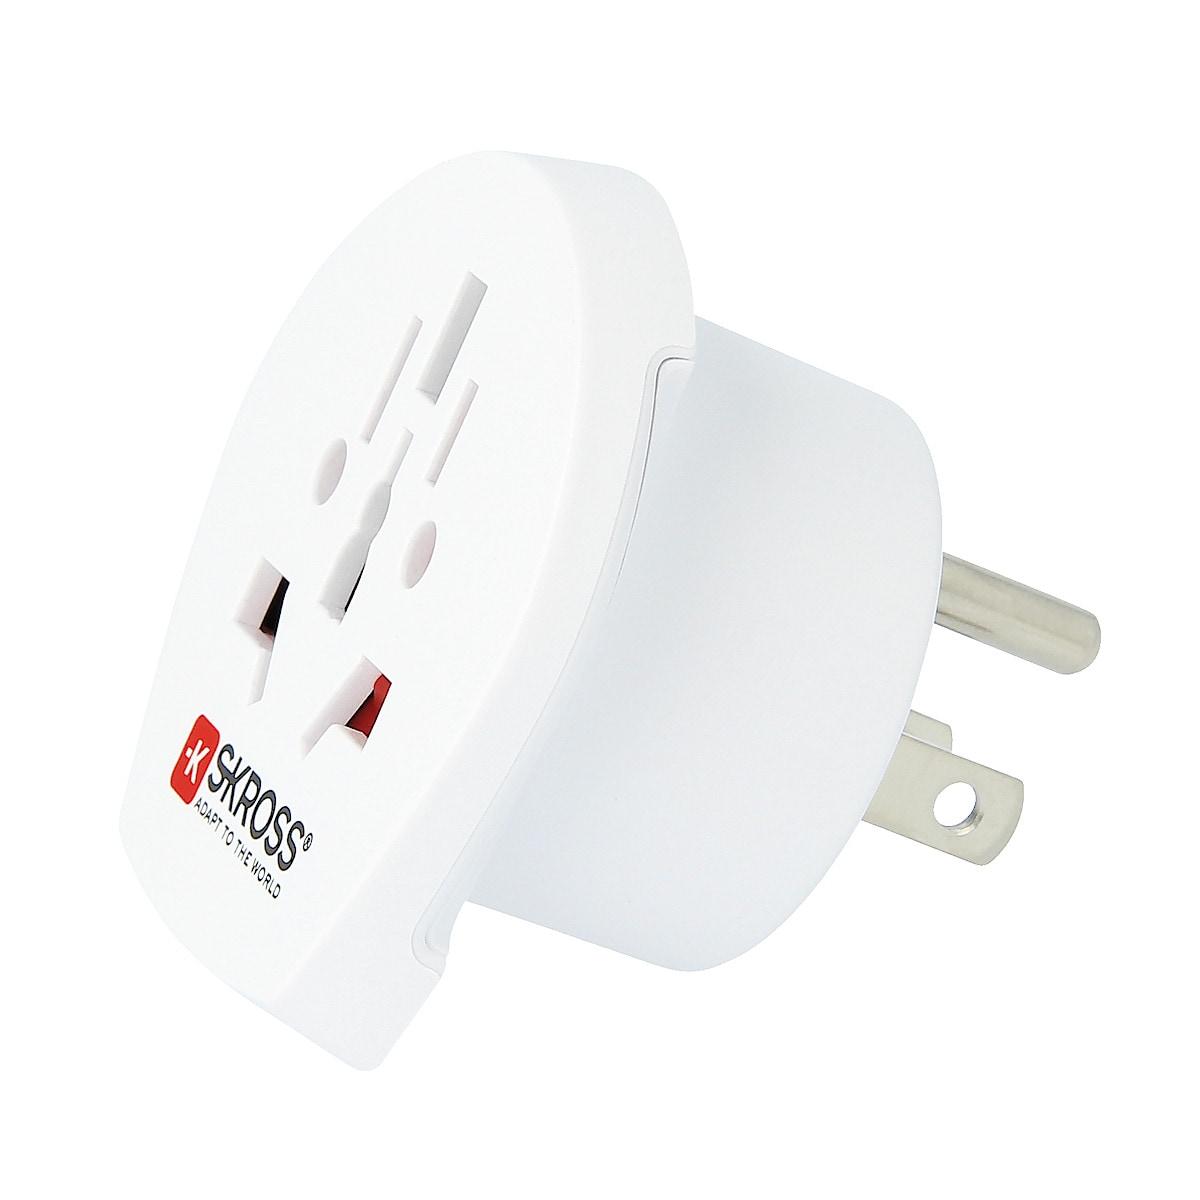 SKROSS World to USA Travel Adaptor Plug